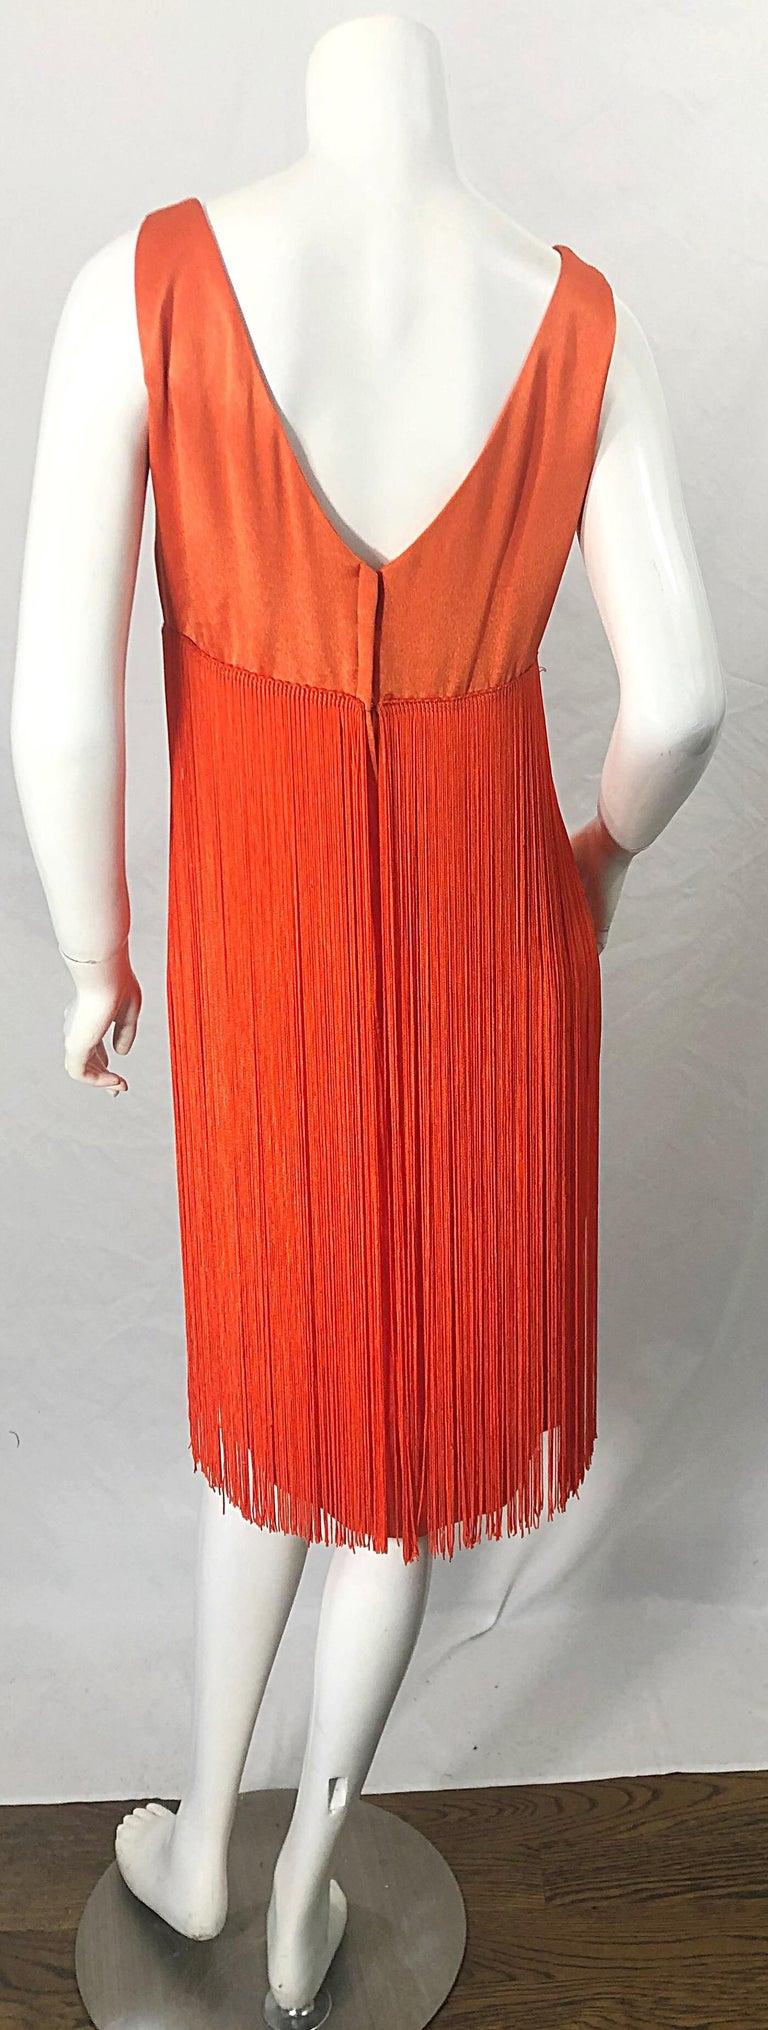 Red 1960s Joseph Magnin Neon Orange Fully Fringed Vintage 60s Flapper Dress For Sale